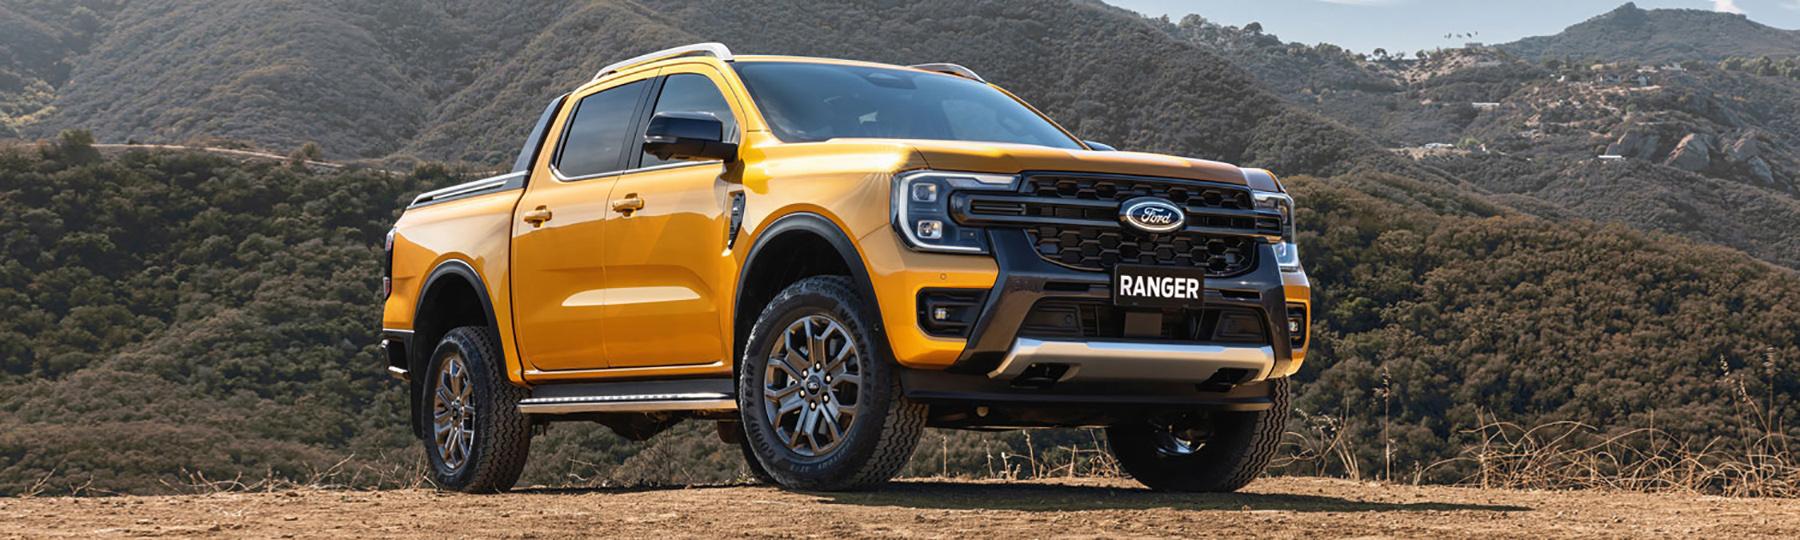 Ford Ranger Privilege Van Offer